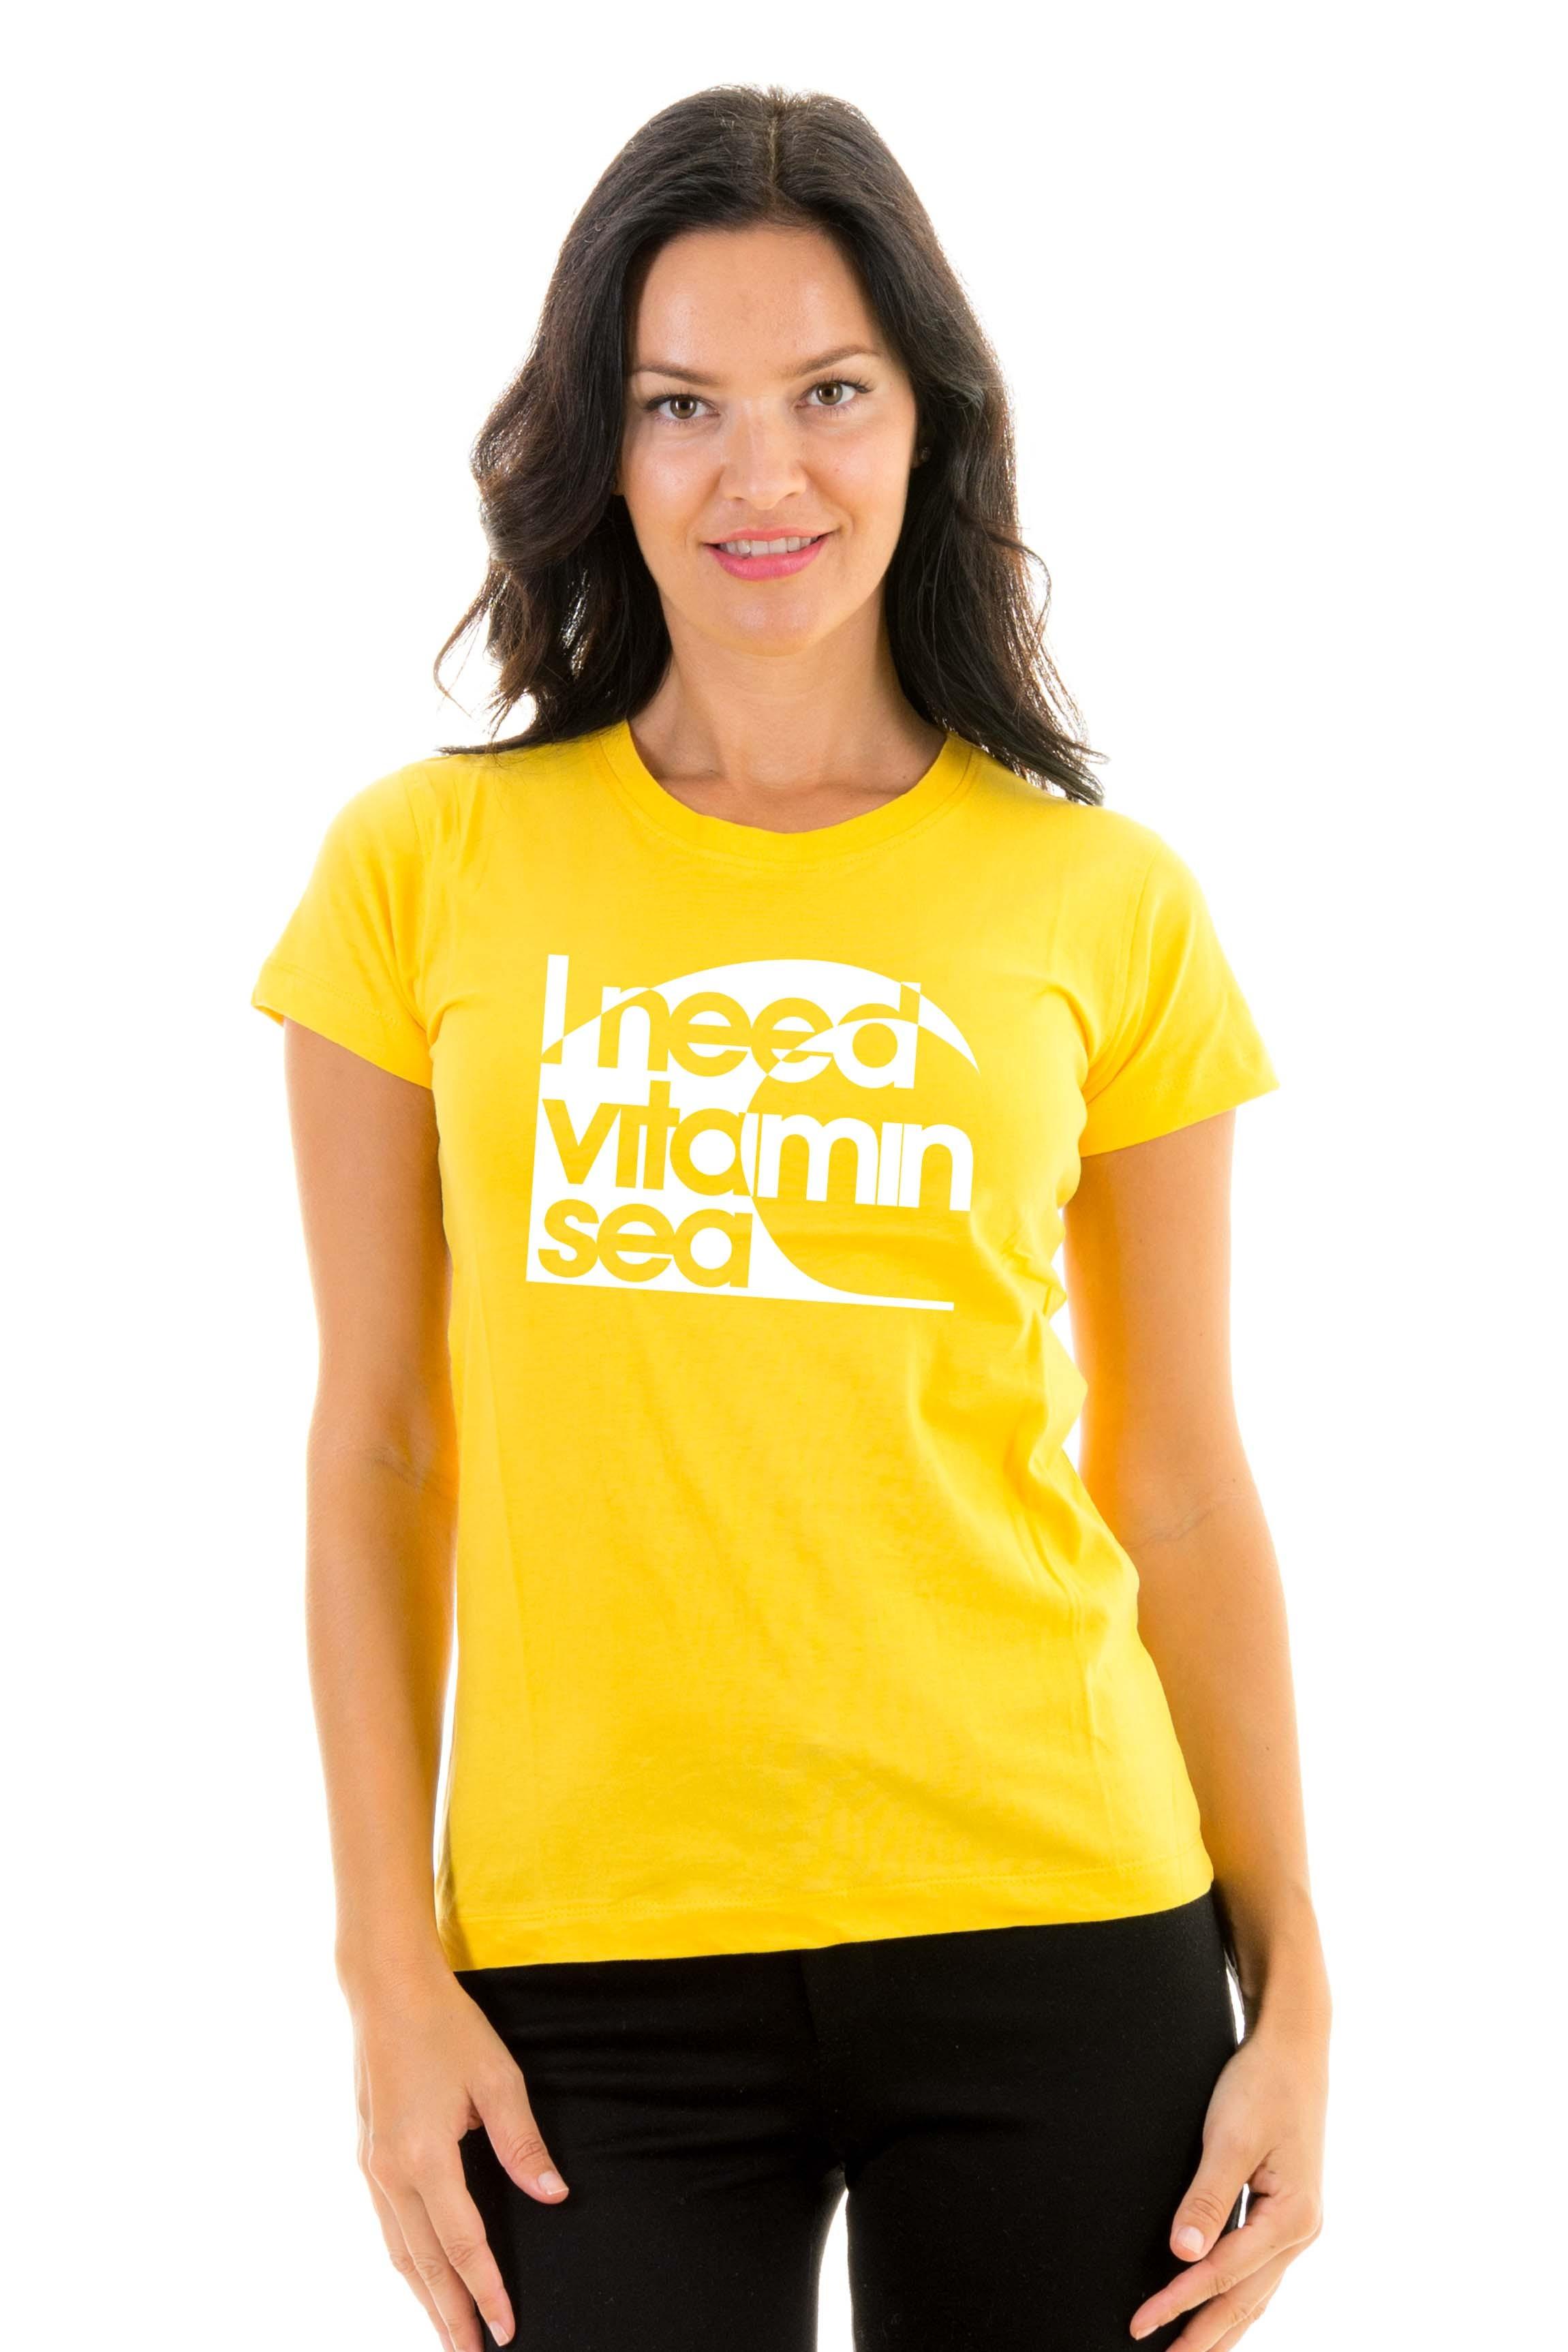 T Shirt I Need Vitamin Sea New Designs Designs